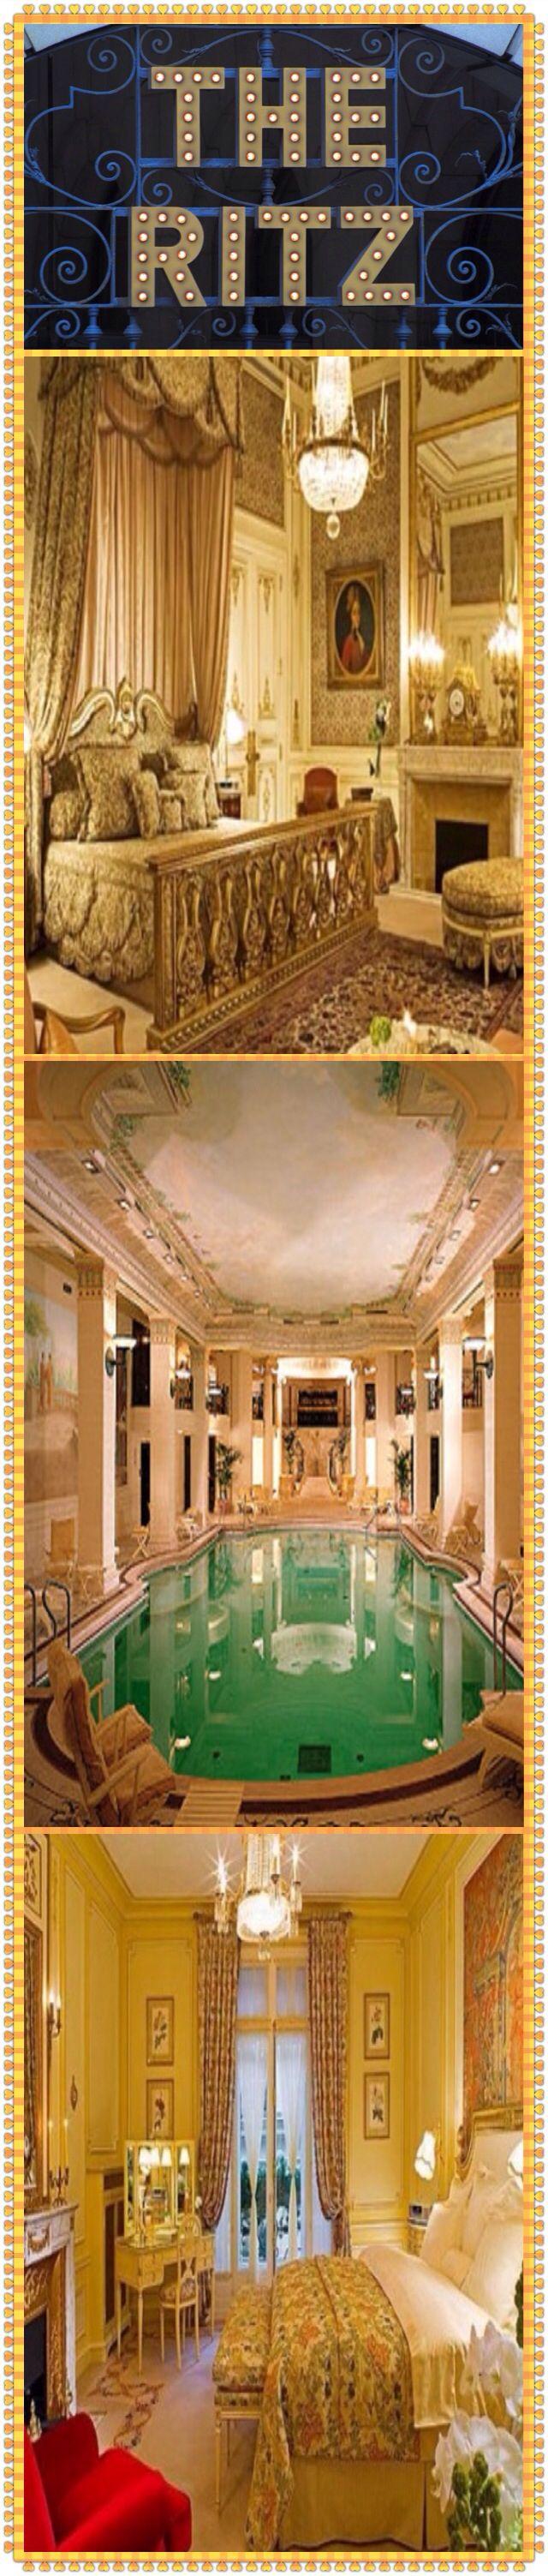 Luxury at The Ritz Carlton Hotel⭐️| re-pinned by www.wfpcc.com